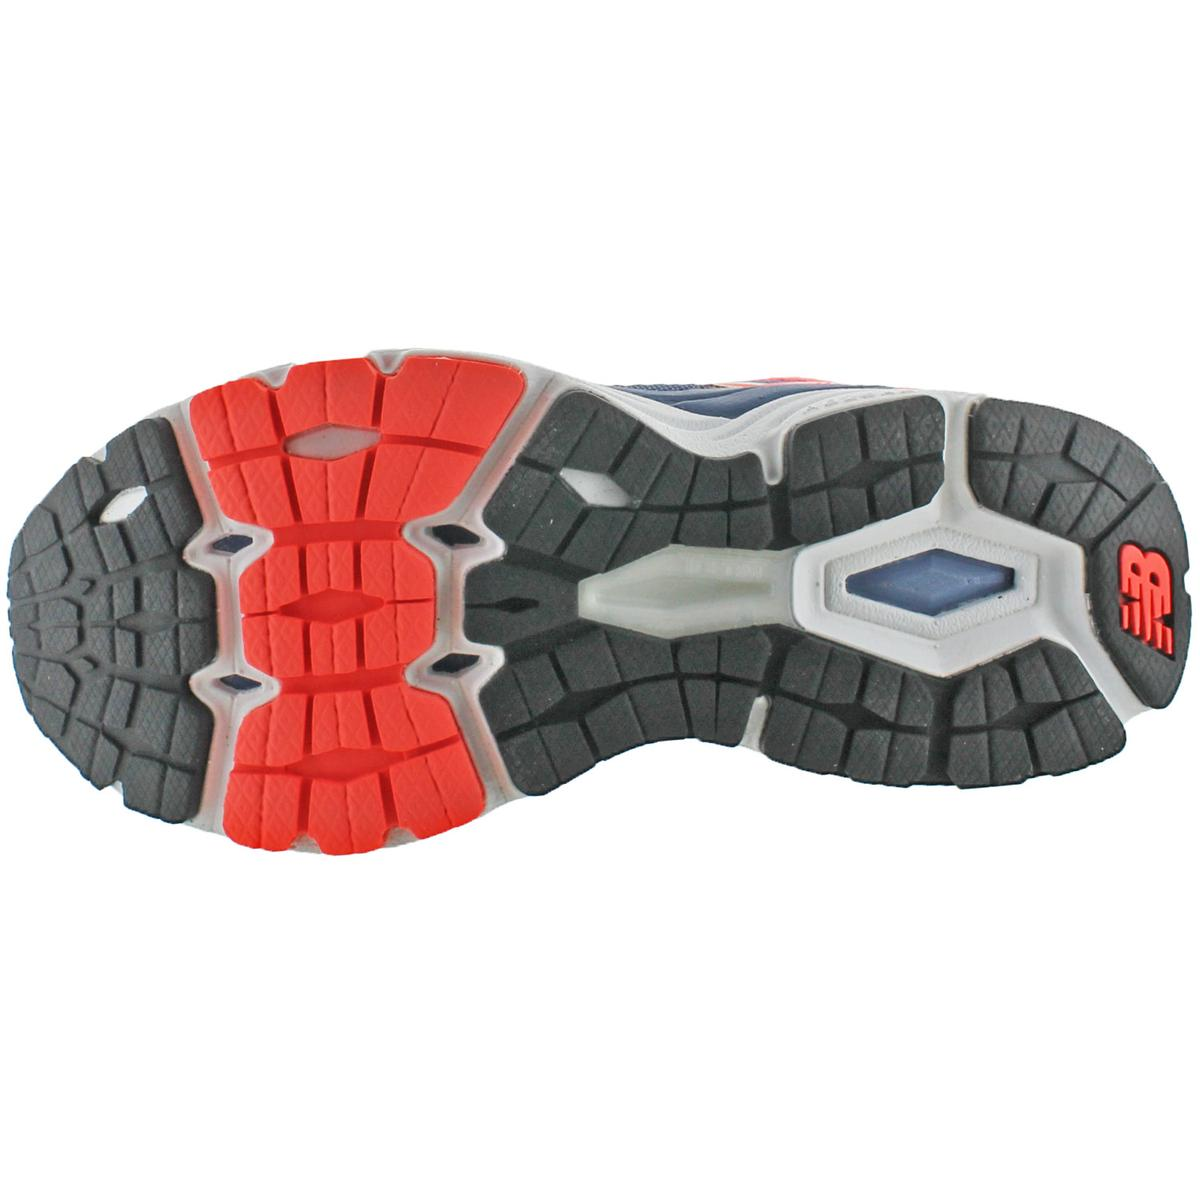 Shoes Womens New Running 6 Training 5 W880pg5 Balance Medium Cross 5PqSnqYw